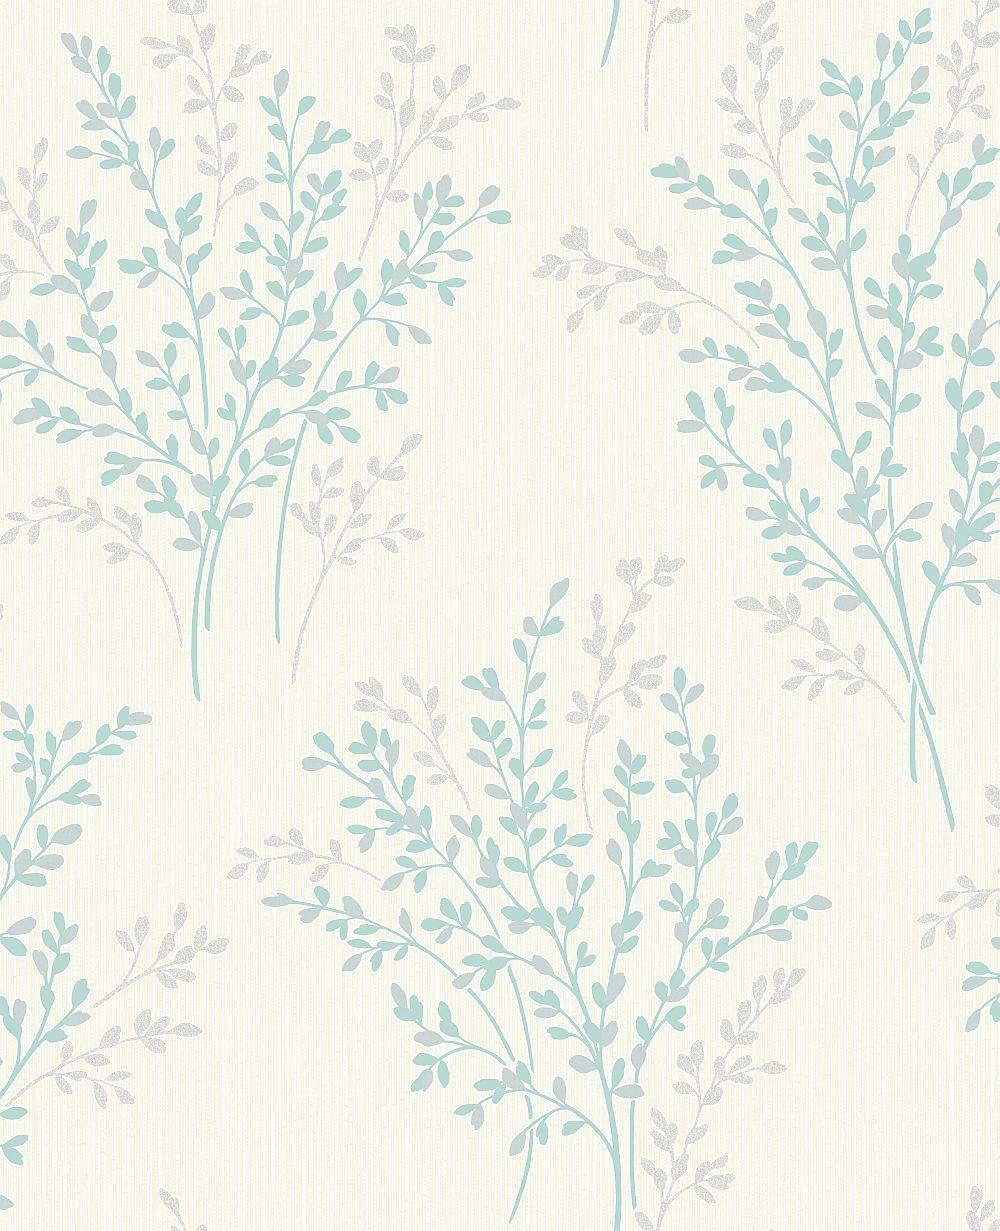 Home diy wallpaper illustration arthouse imagine fern plum motif vinyl - A Pretty Glitter Design With A Teal Coloured Fern Motif On A Soft Neutral Background